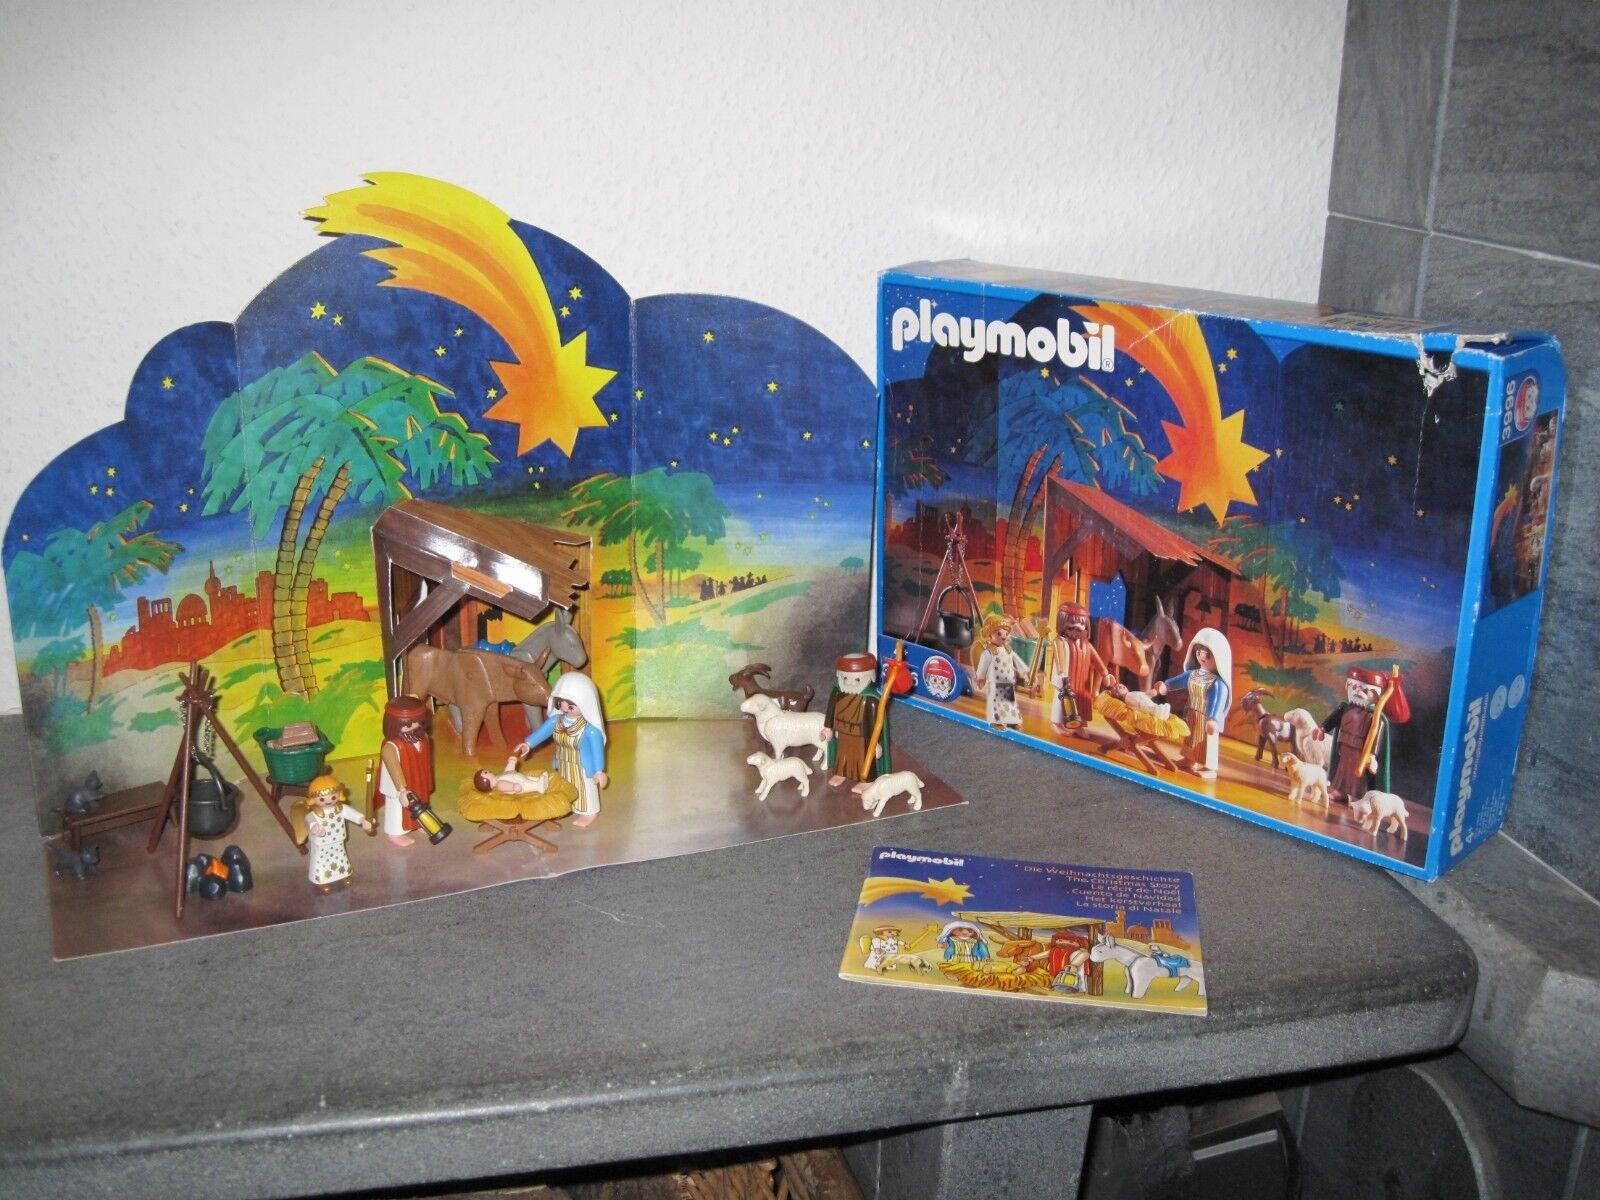 Playmobil 3996 - Weihnachtskrippe - Vollständig - OVP - Aufbauanleitung